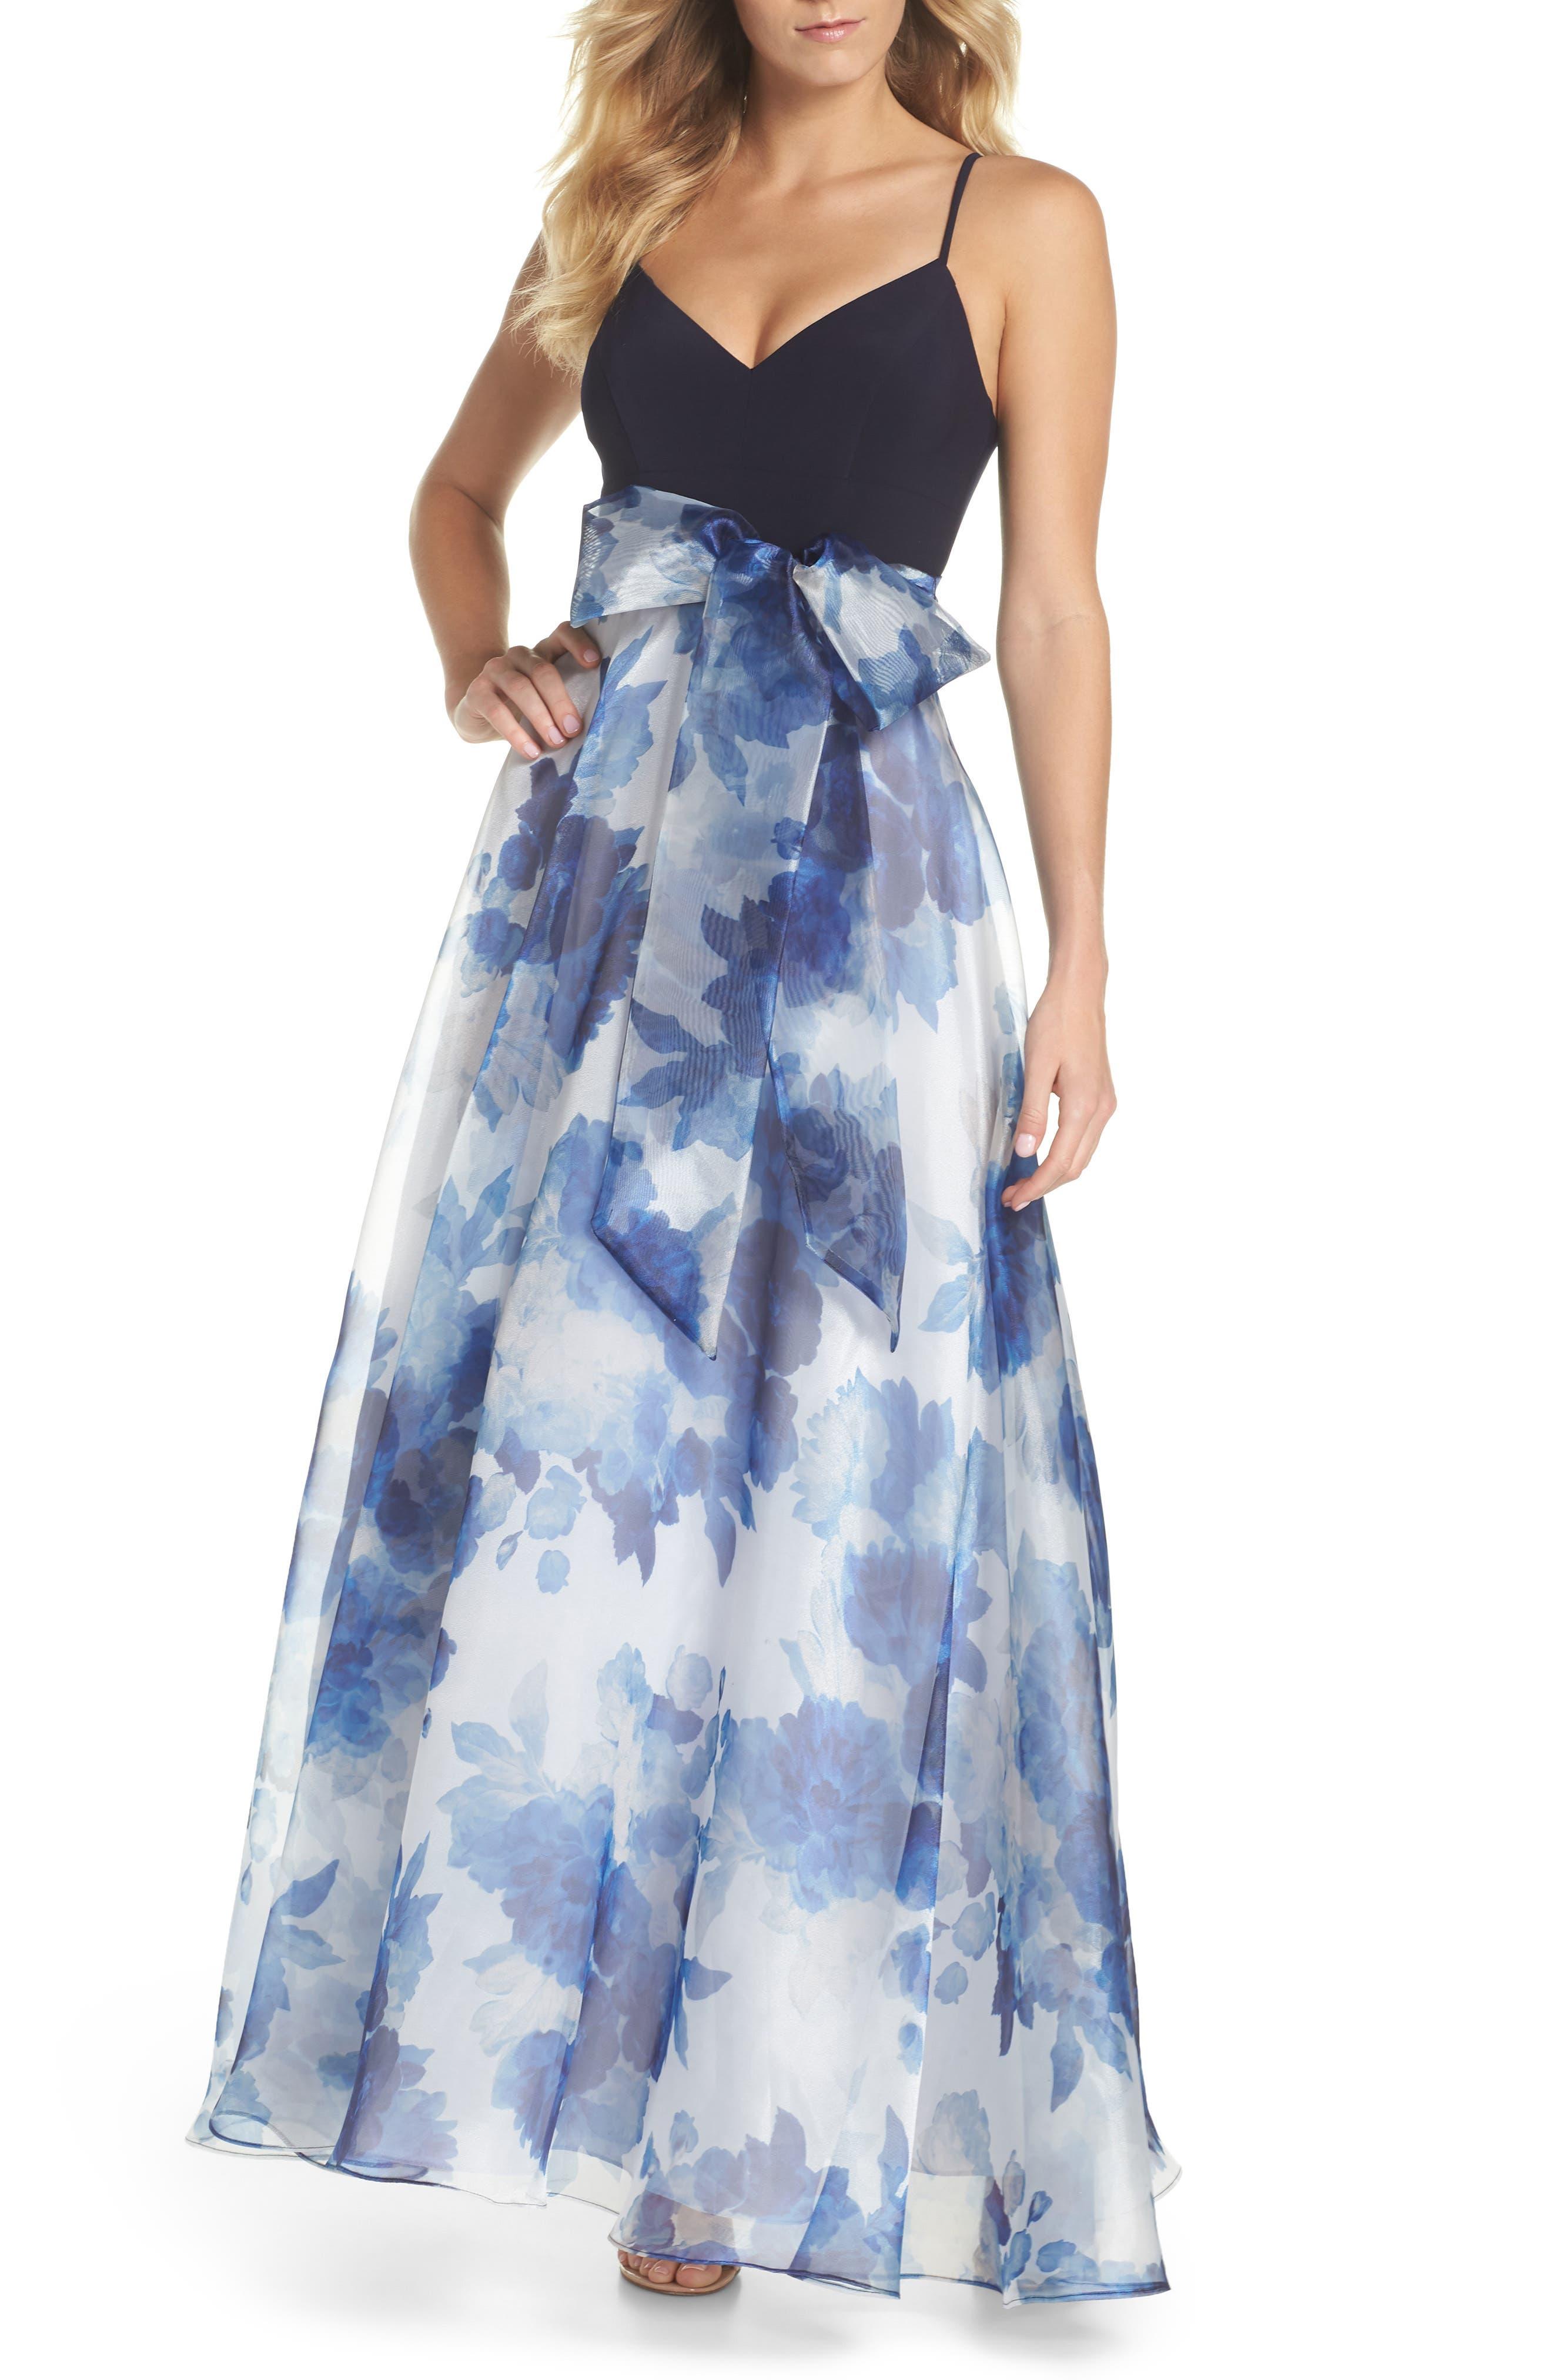 Floral Organza Gown,                             Main thumbnail 1, color,                             411